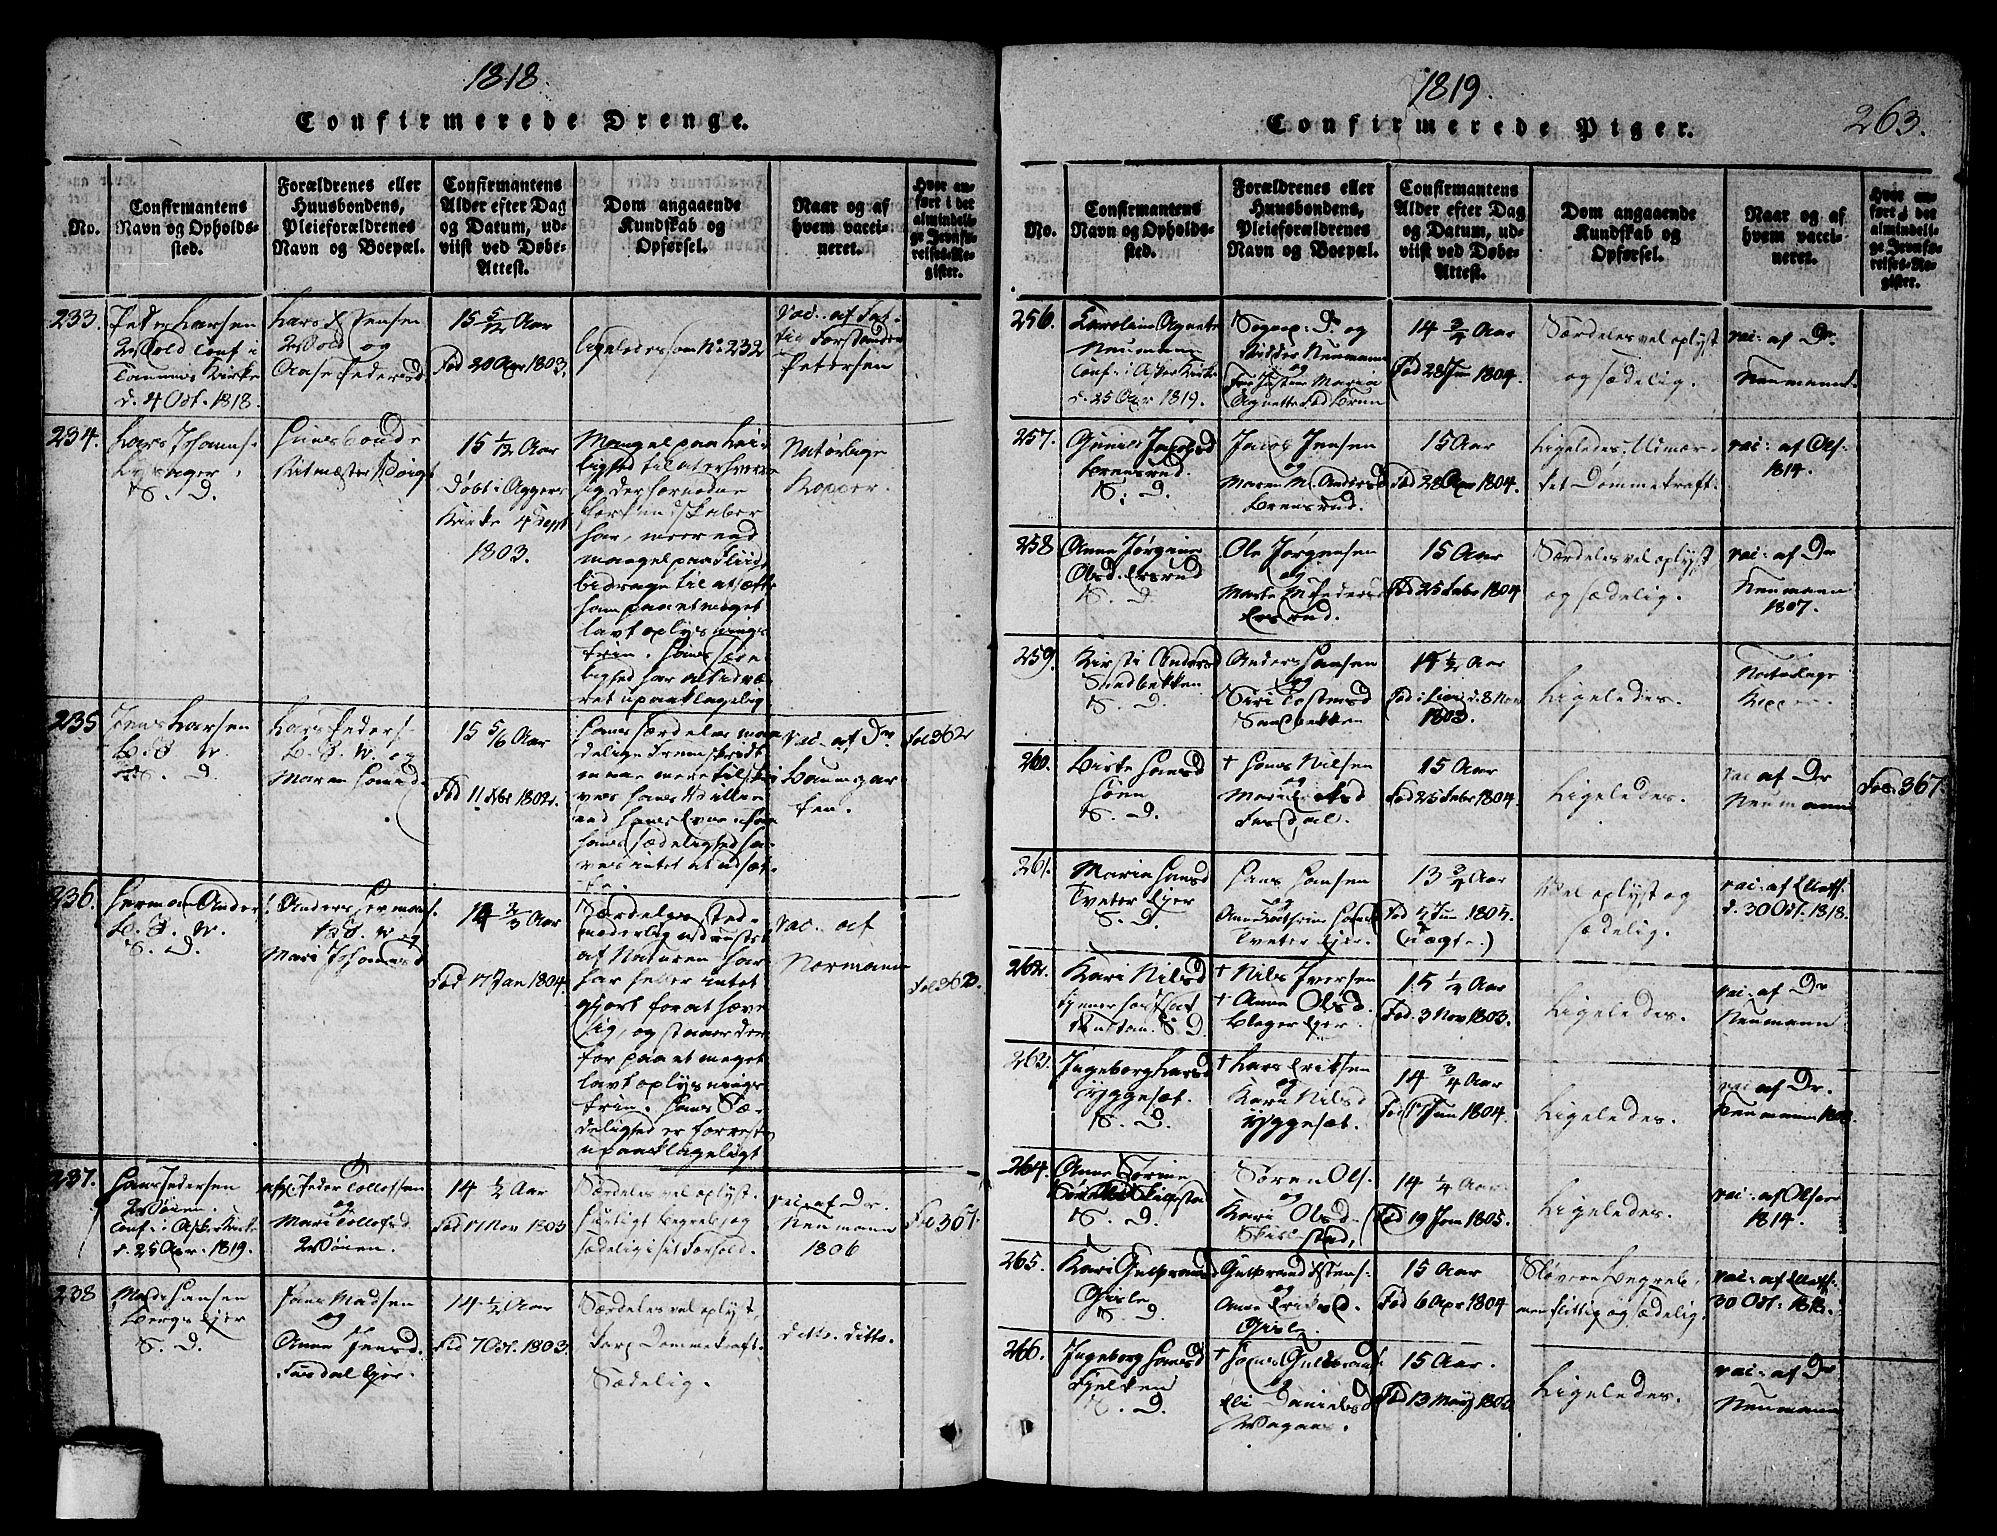 SAO, Asker prestekontor Kirkebøker, G/Ga/L0001: Klokkerbok nr. I 1, 1814-1830, s. 263